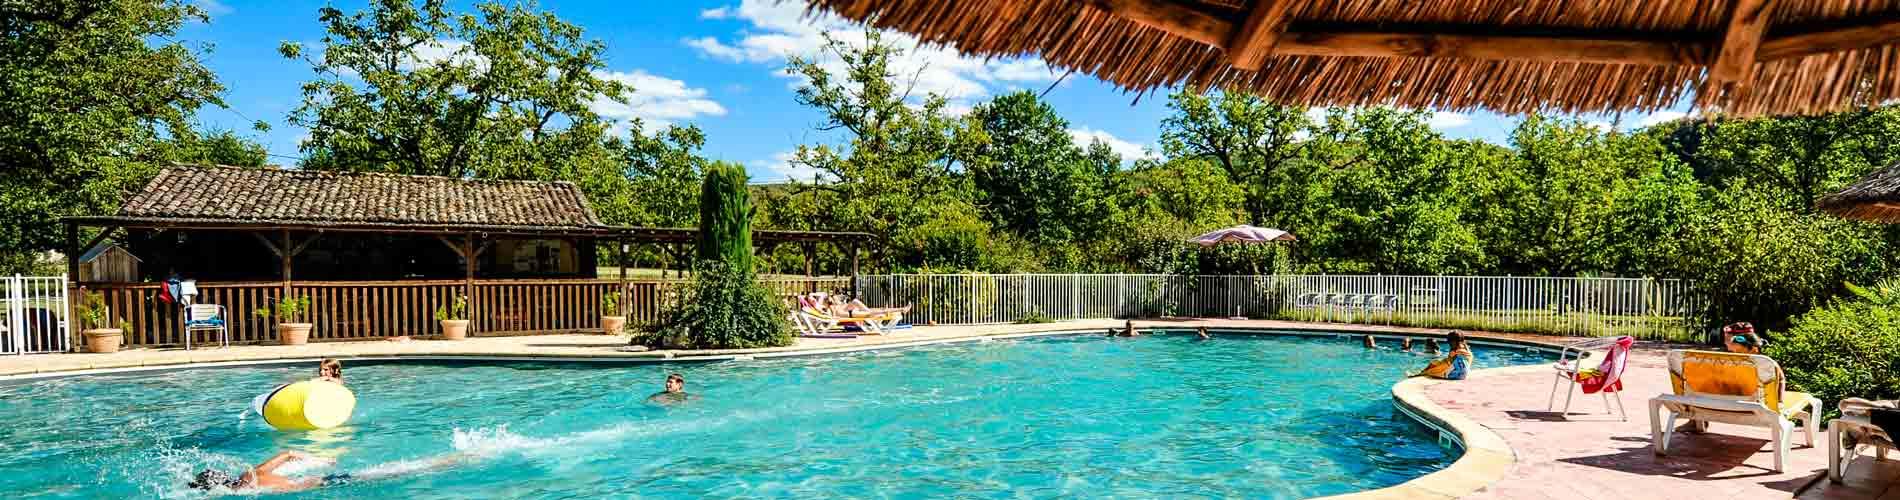 Camping lot avec piscine camping avec espace quatique for Camping avranches avec piscine